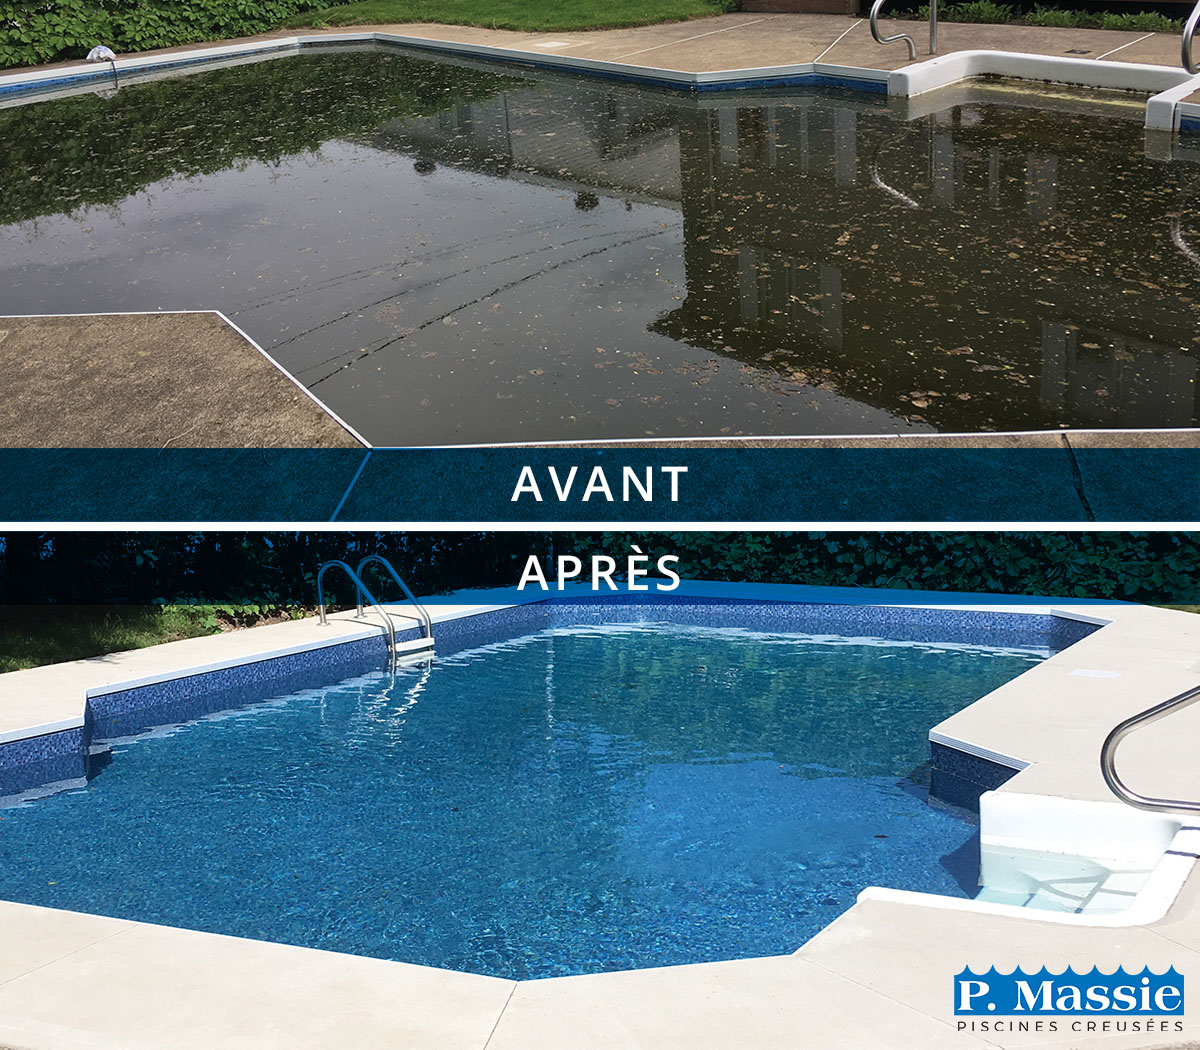 Restauration de piscine  Rnovation et rparation  Piscines P Massie